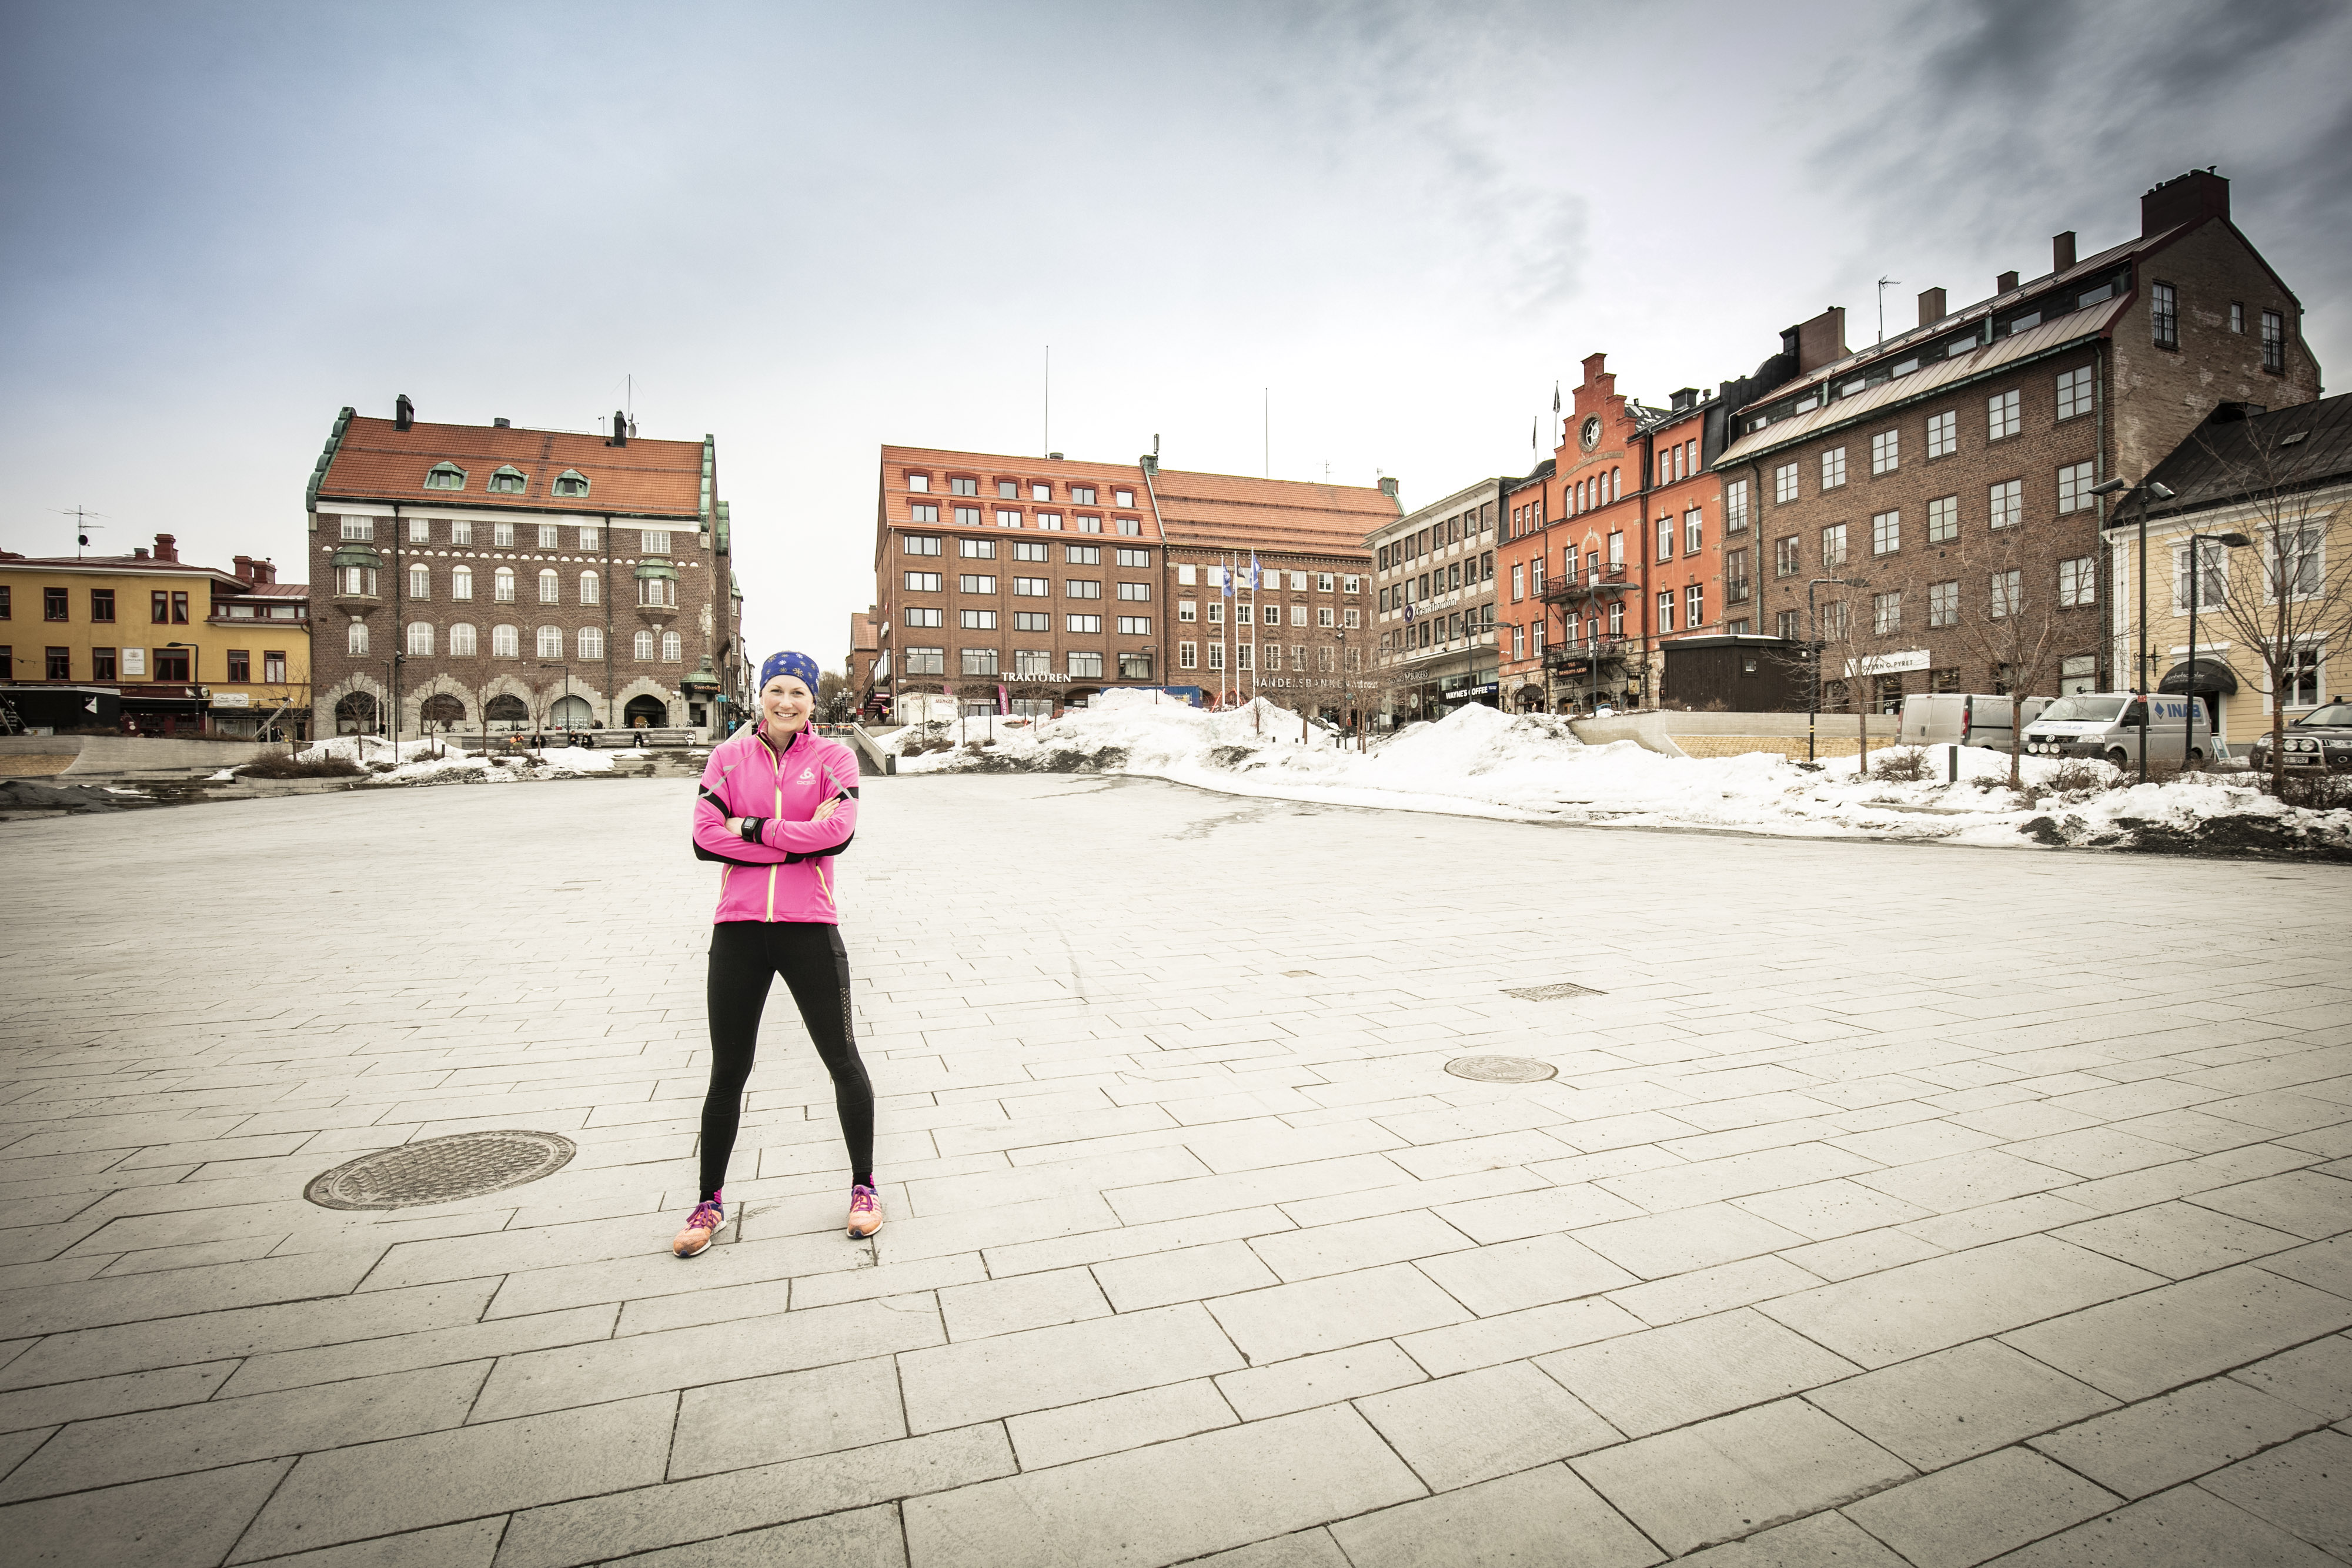 Skidskytte Biathlon